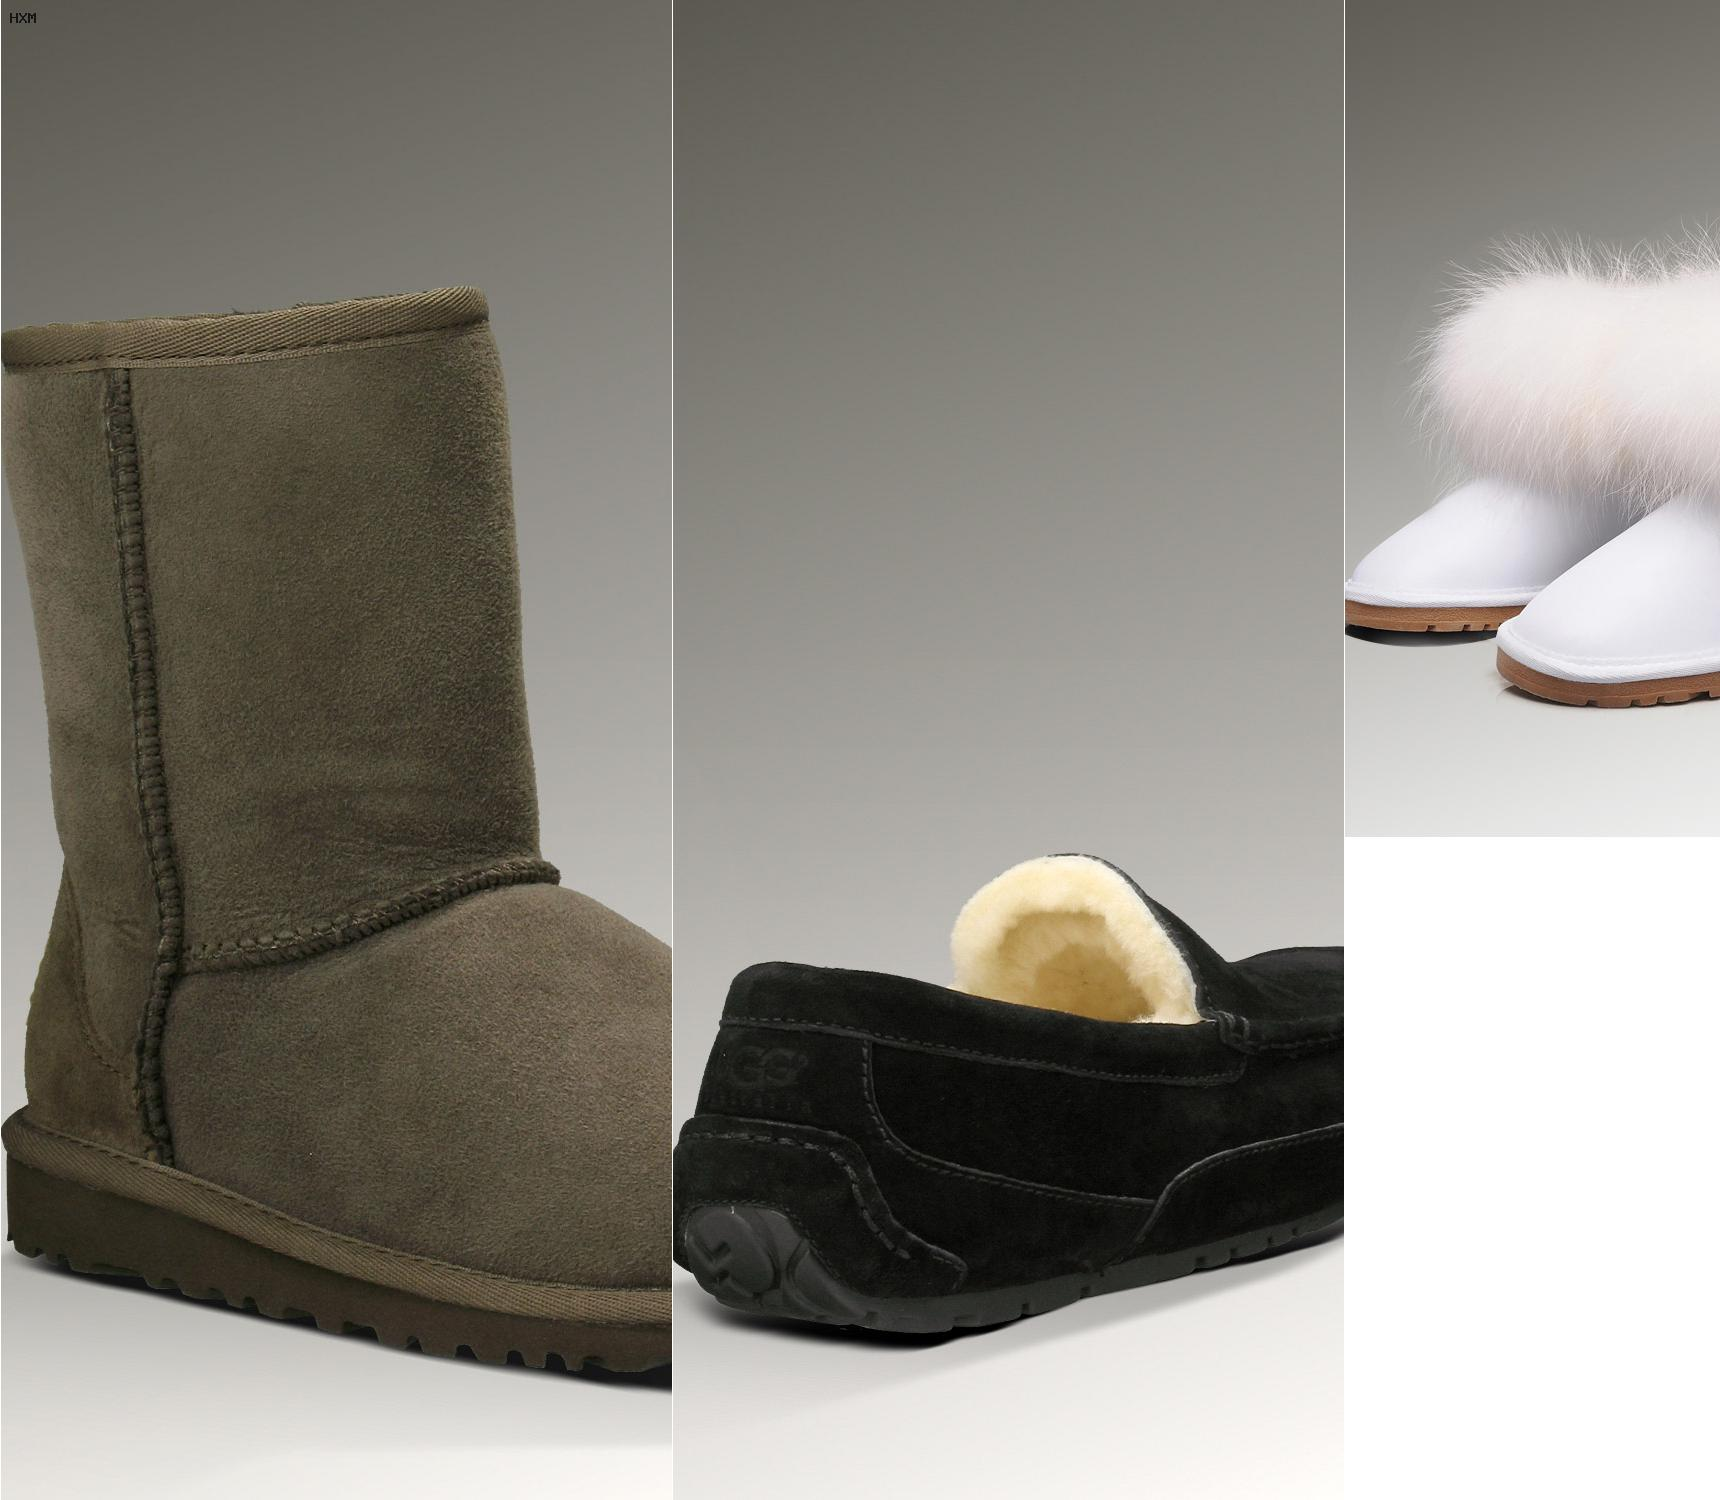 botas ugg para invierno